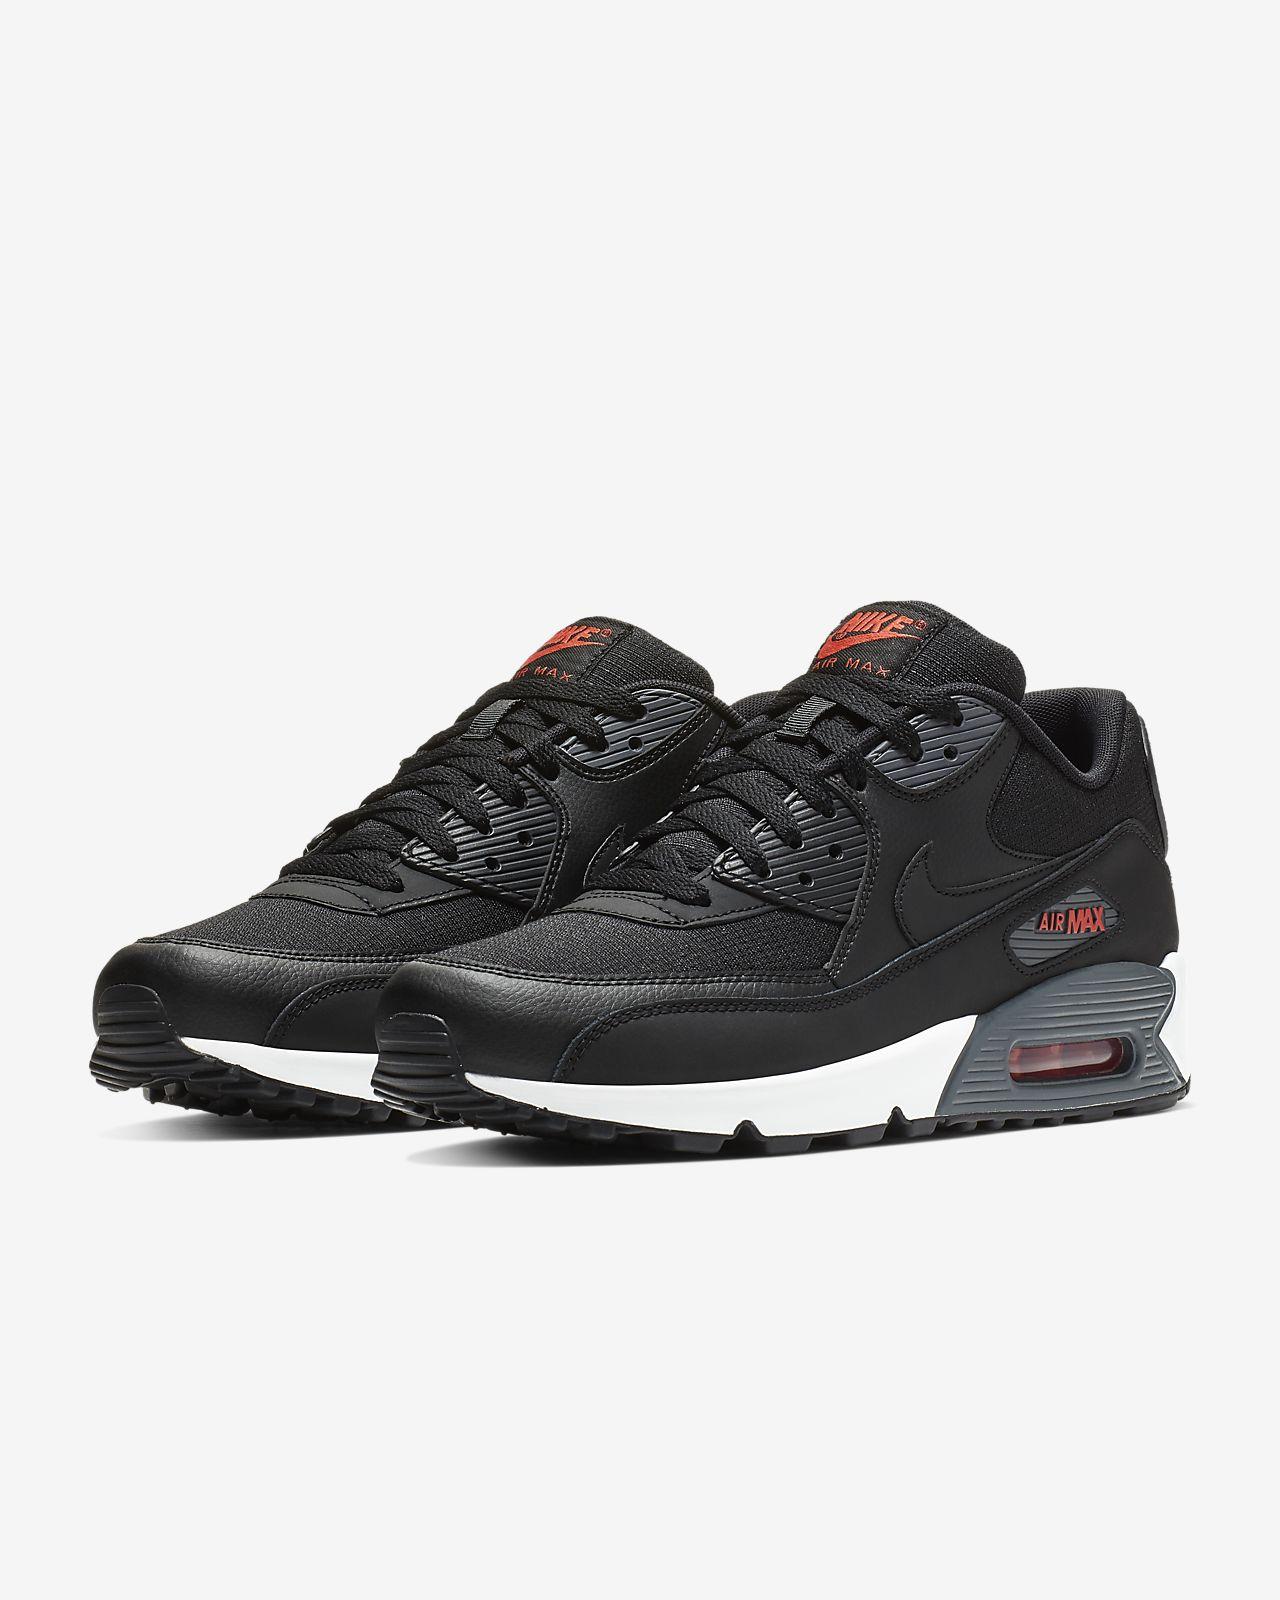 online store 4fc60 1fc7b ... Nike Air Max 90 SE Herrenschuh